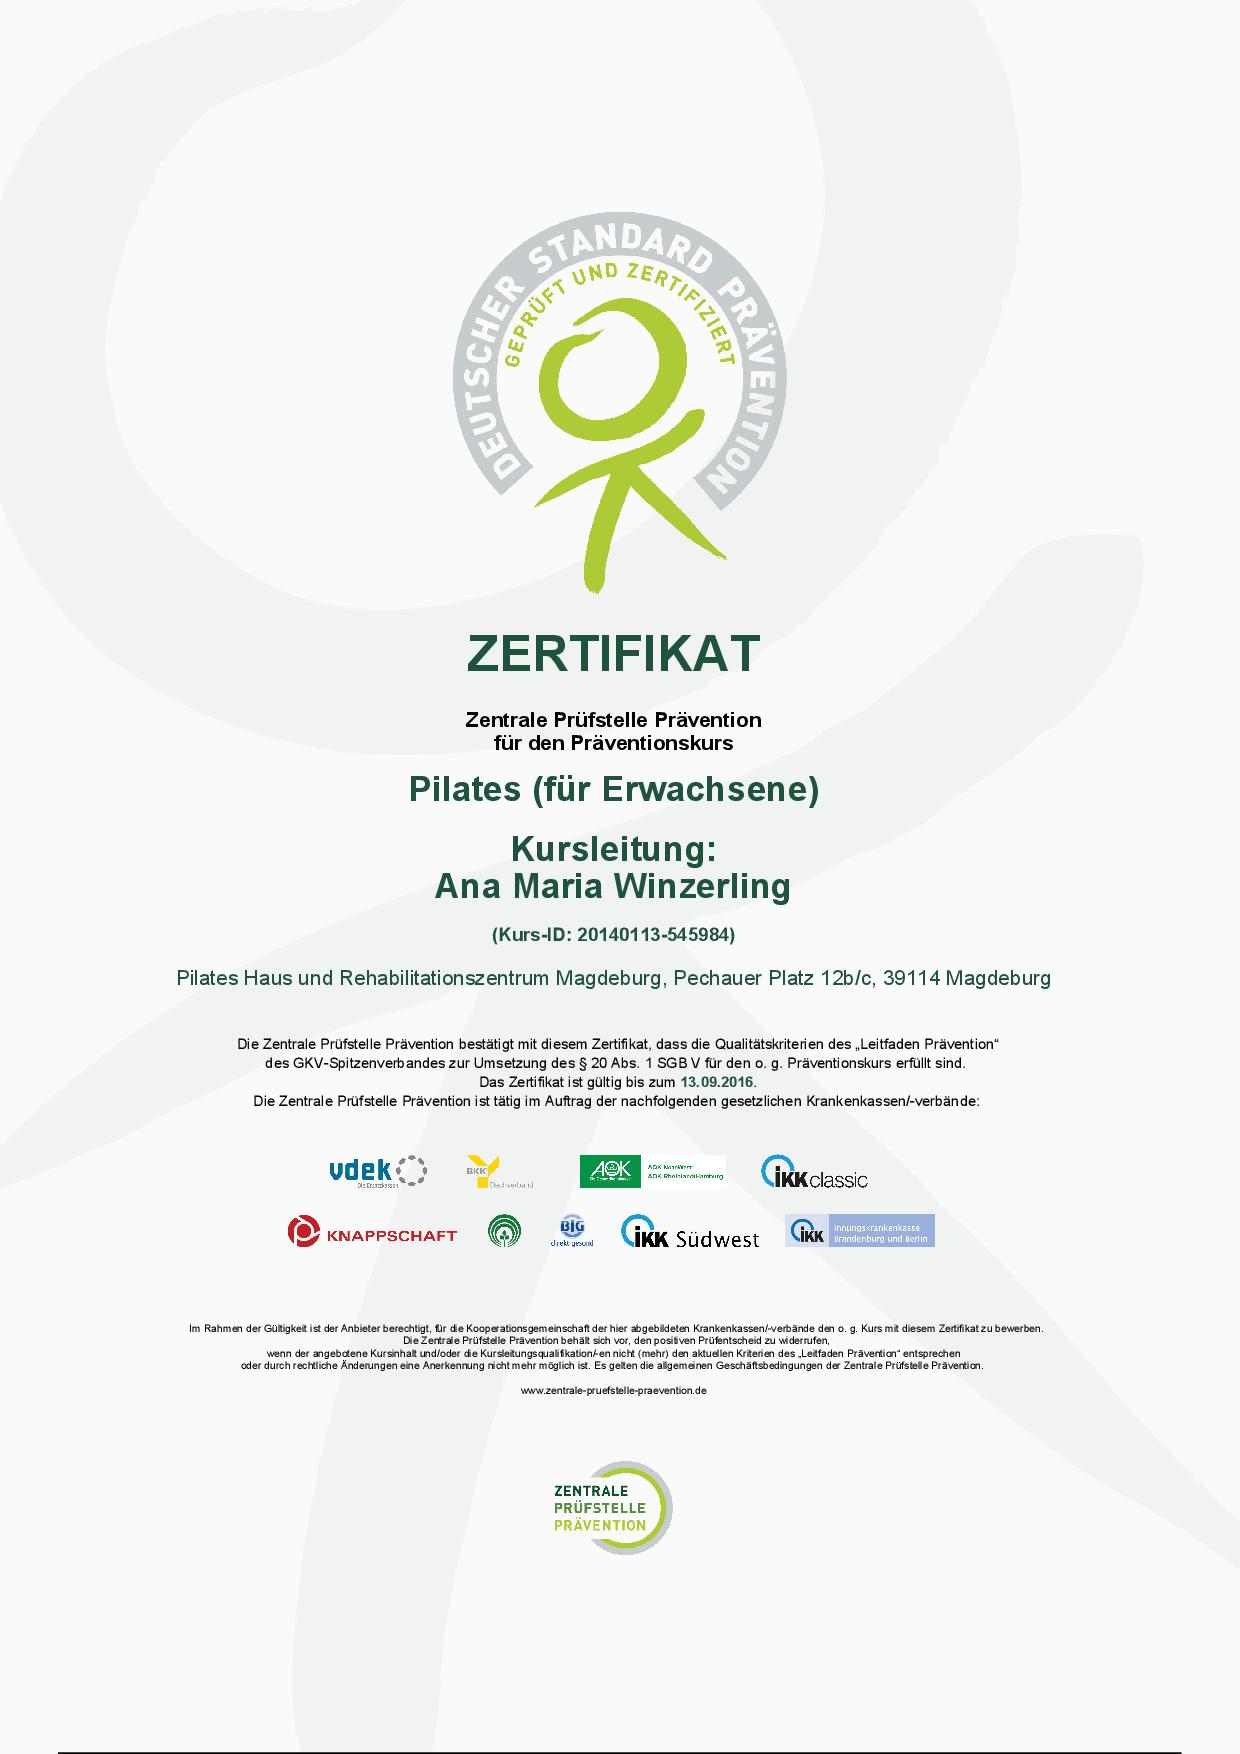 zertifikat_20140113-545984-001